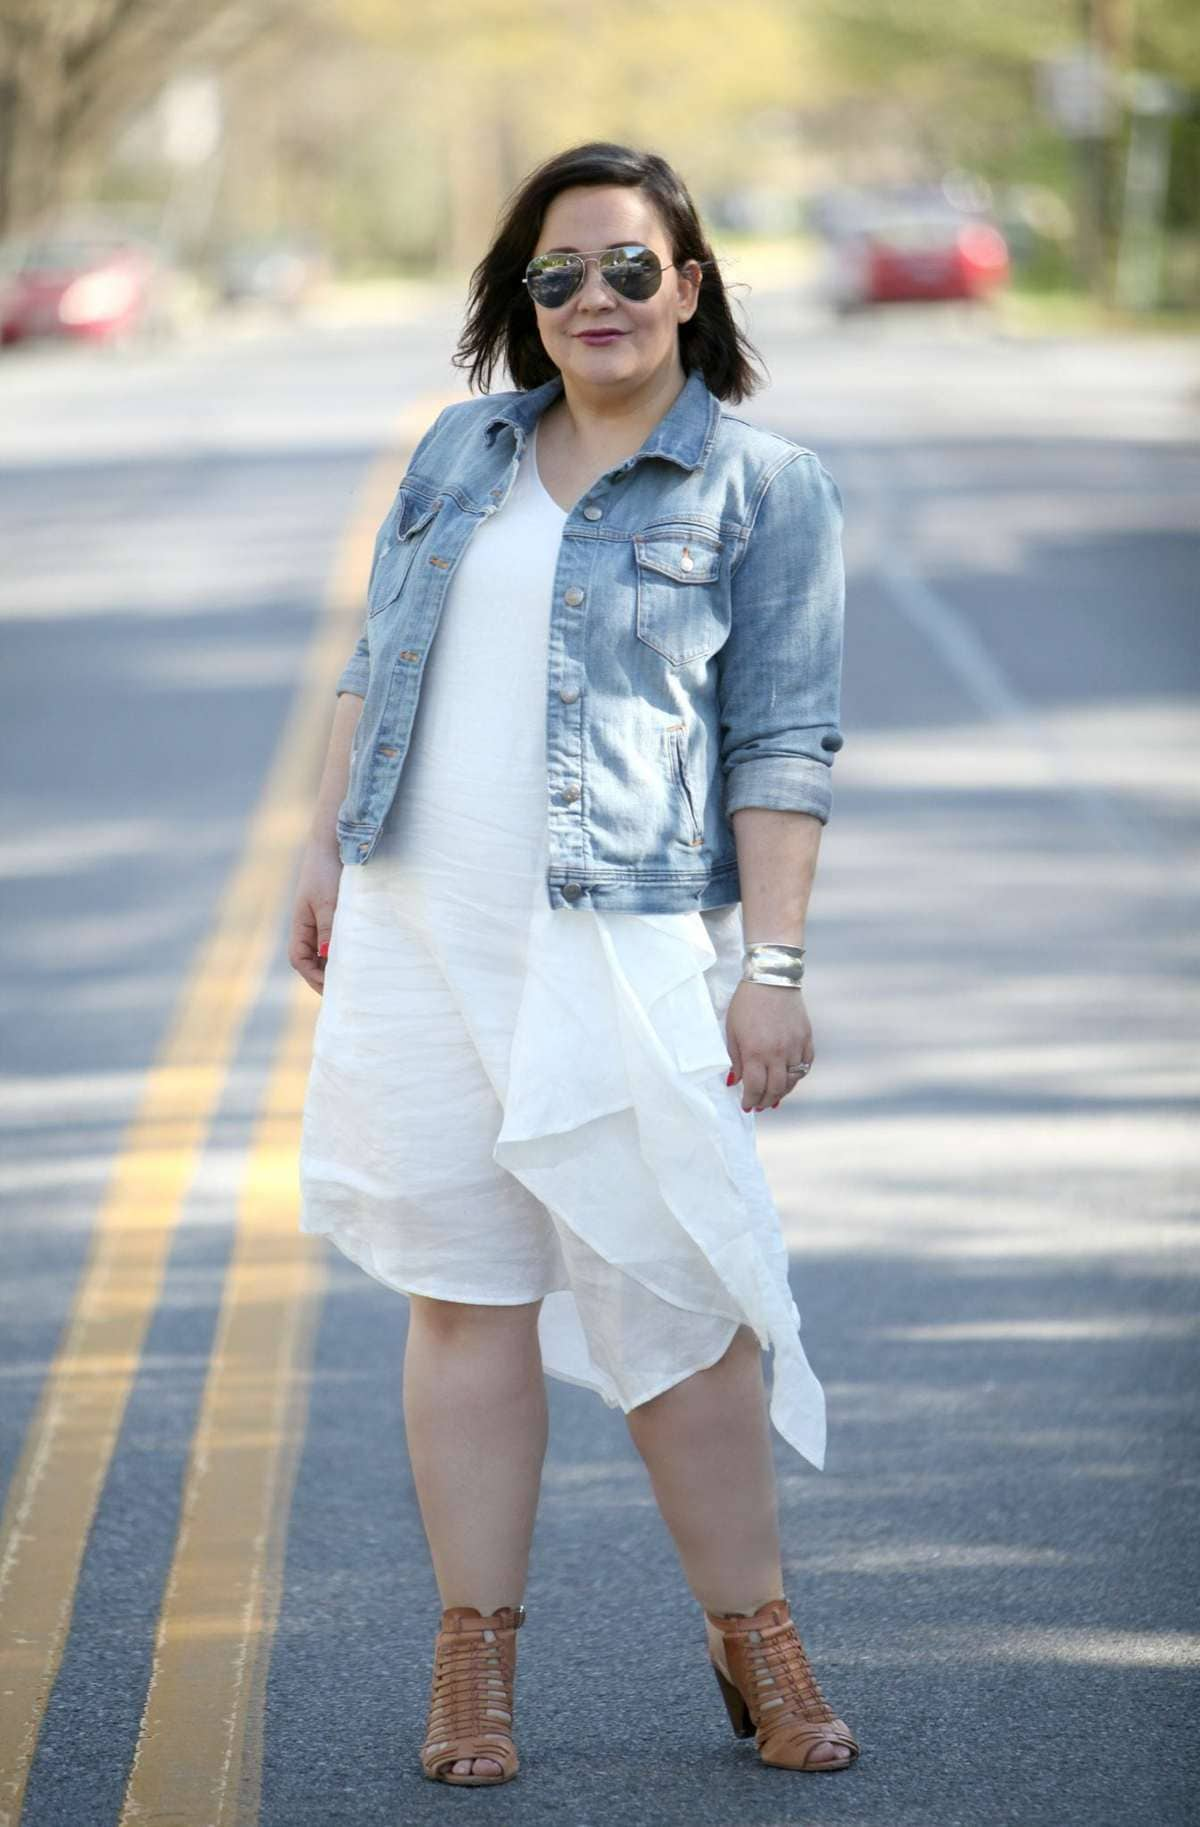 over 40 fashion blogger wardrobe oxygen in a stella carakasi white linen dress